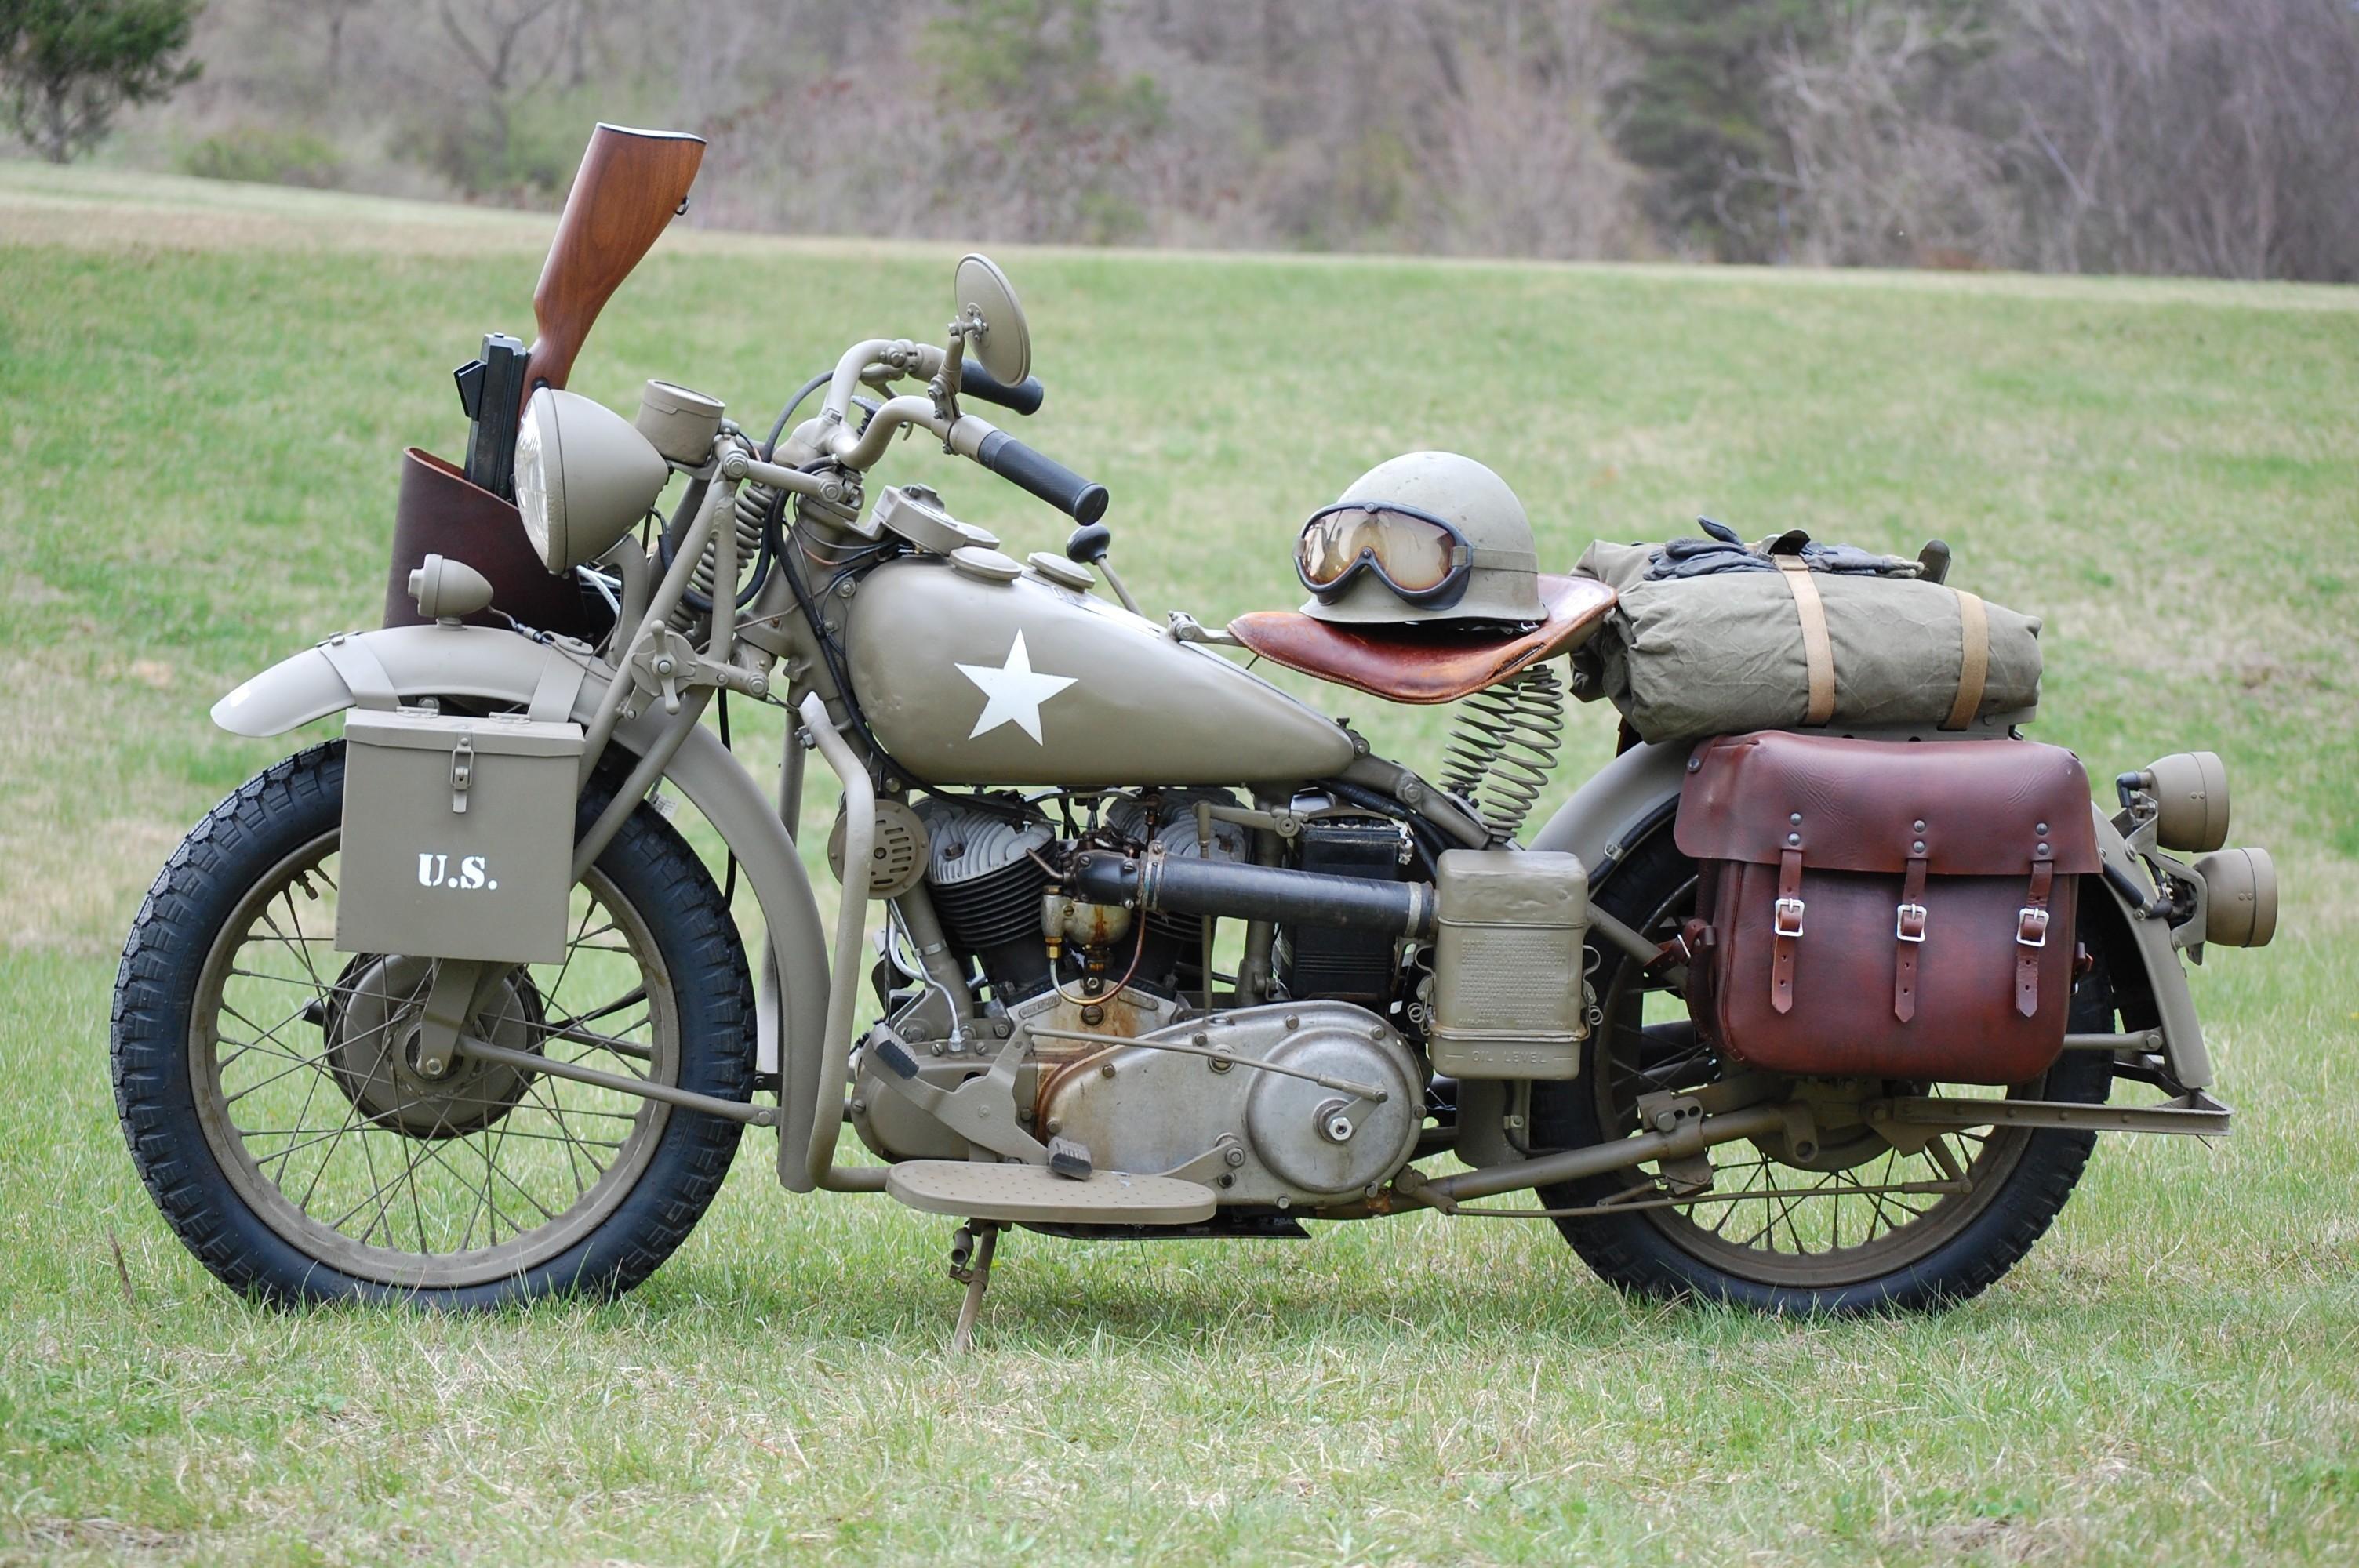 World war ii motorcycles oldschool wallpaper 3008x2000